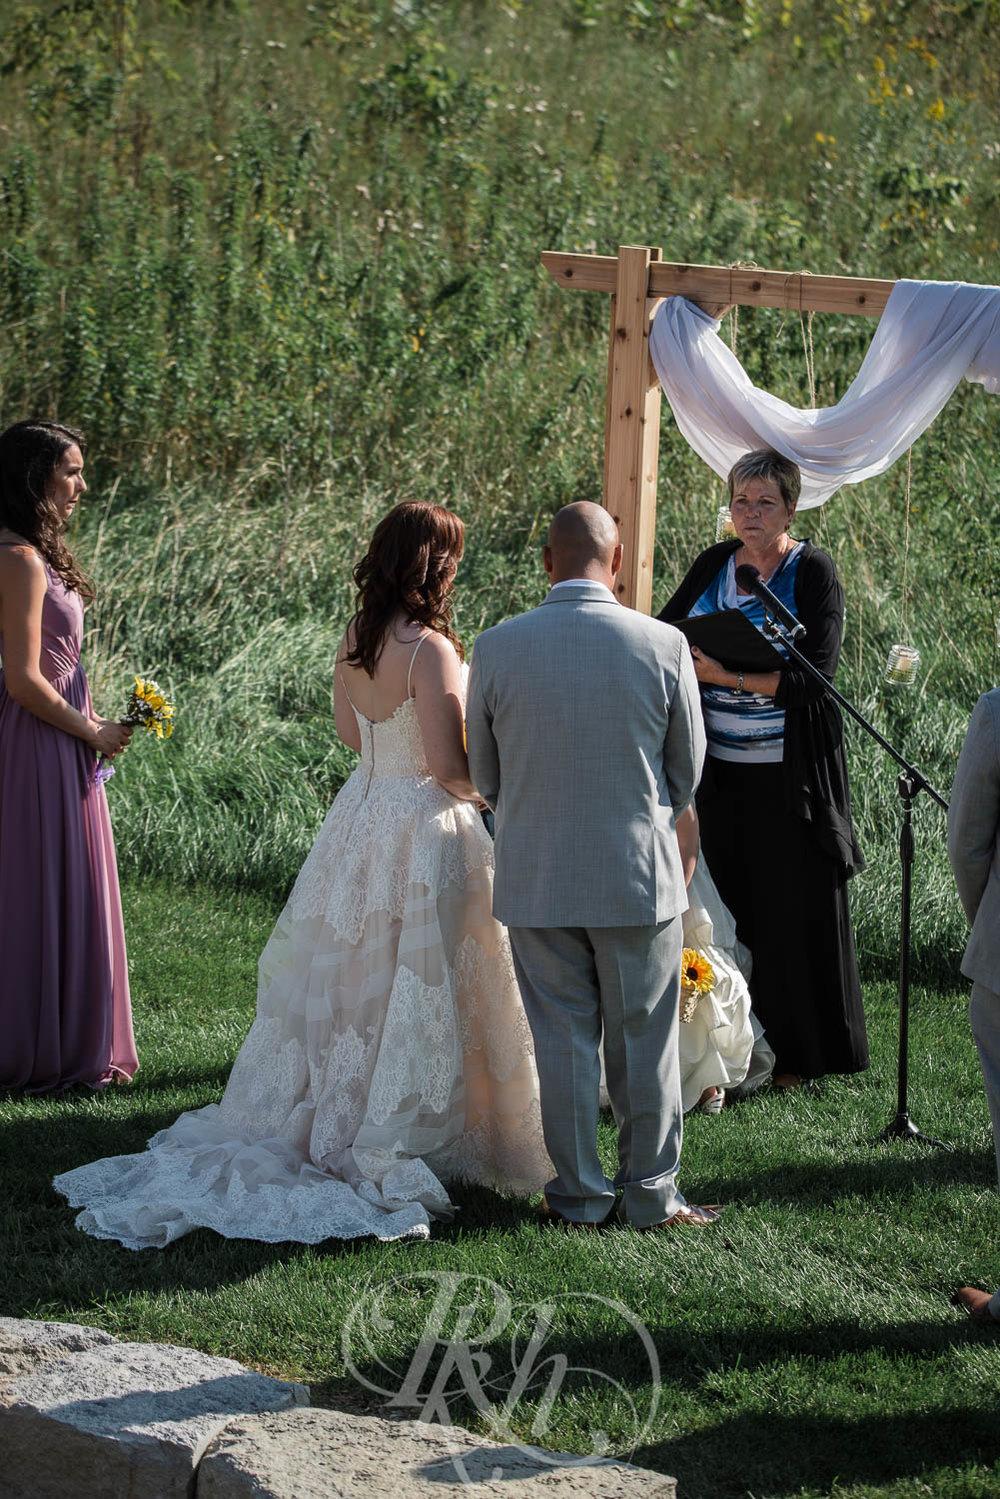 Christy & Matt - Wisconsin Wedding Photography - Birch Hill Barn - RKH Images  (28 of 47).jpg